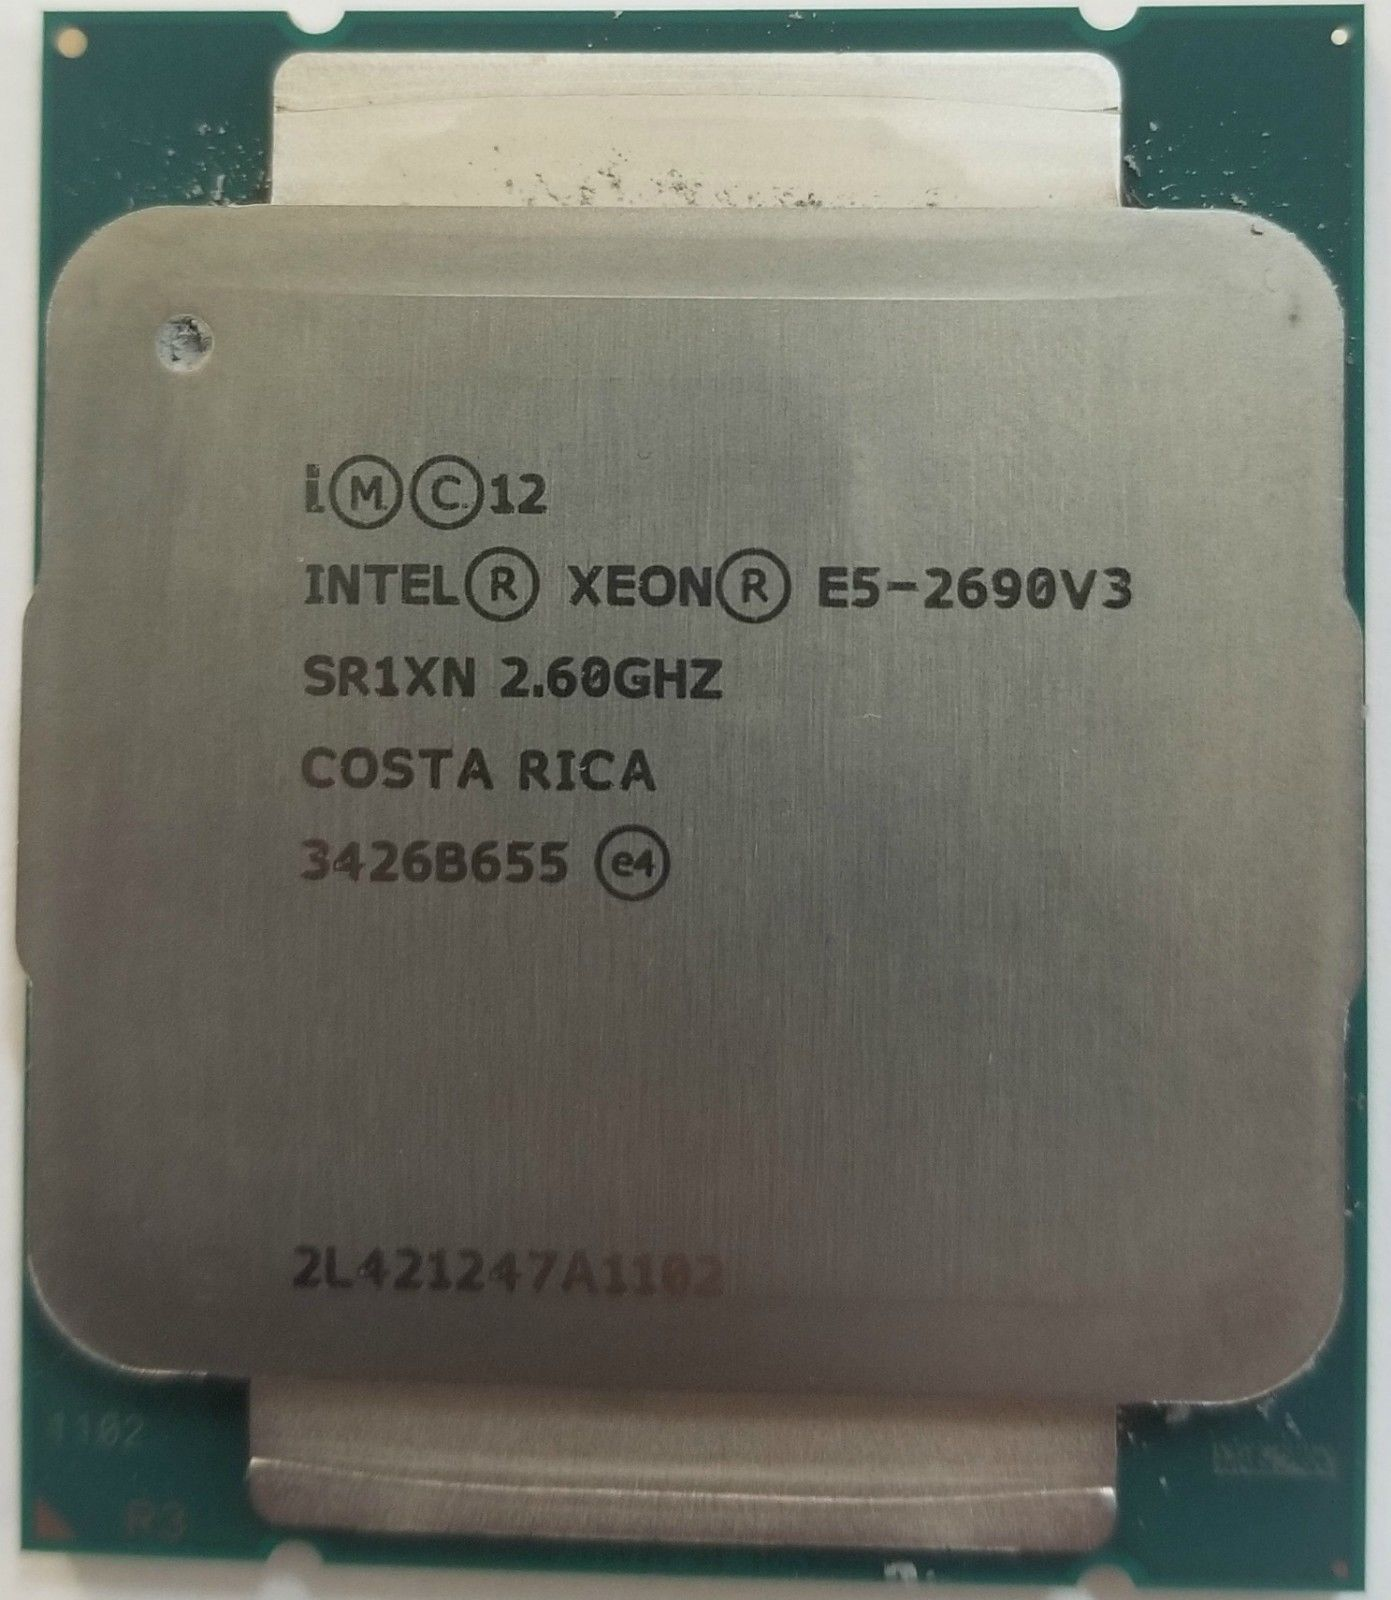 GENUINE INTEL XEON E5 2690V3 SR1XN 26GHZ CPU PROCESSOR TESTED